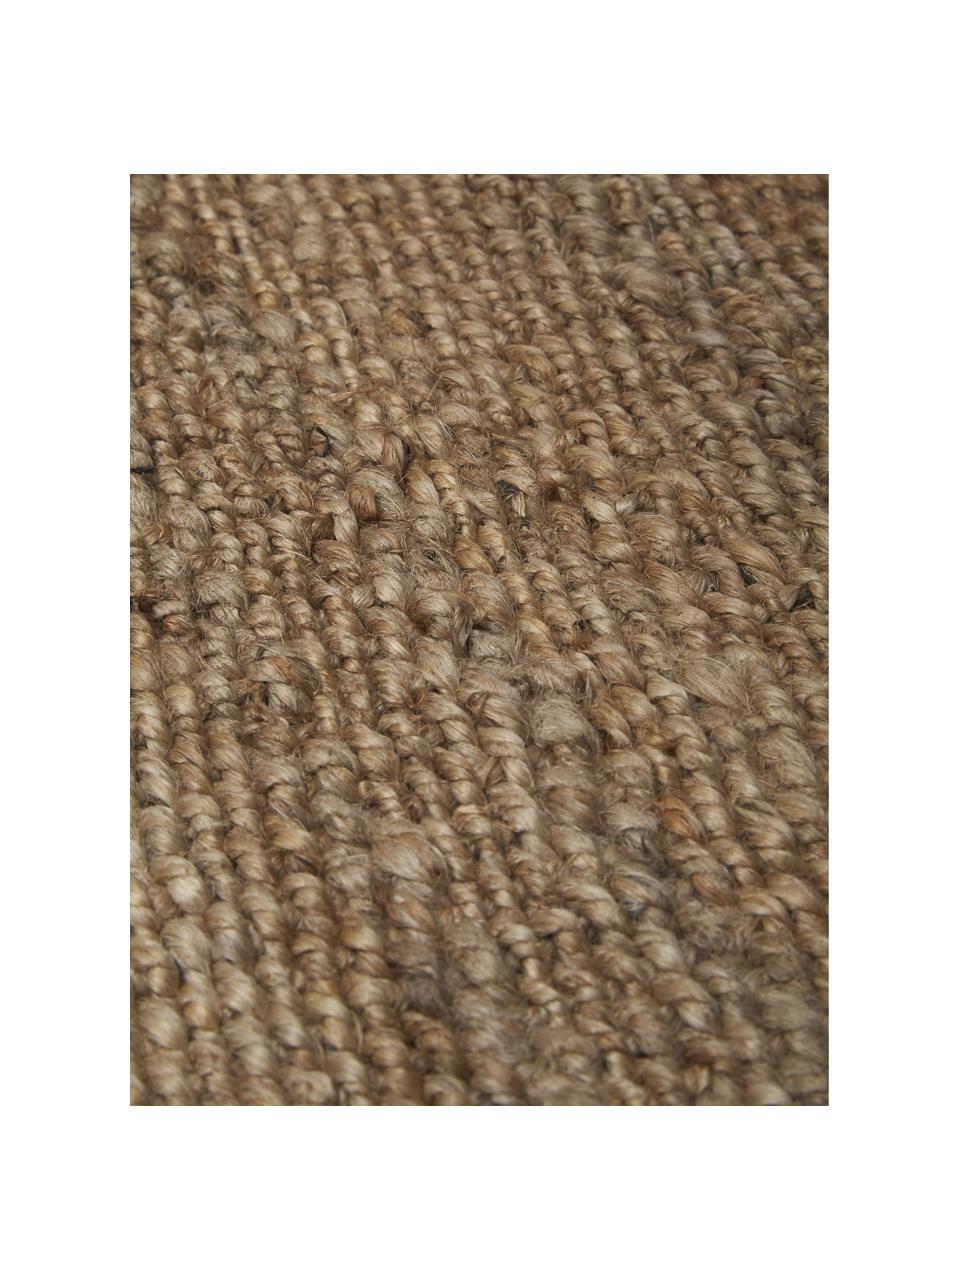 Handgefertigter Jute-Teppich Naturals mit Fransen, 100% Jute, Jute, B 200 x L 300 cm (Größe L)